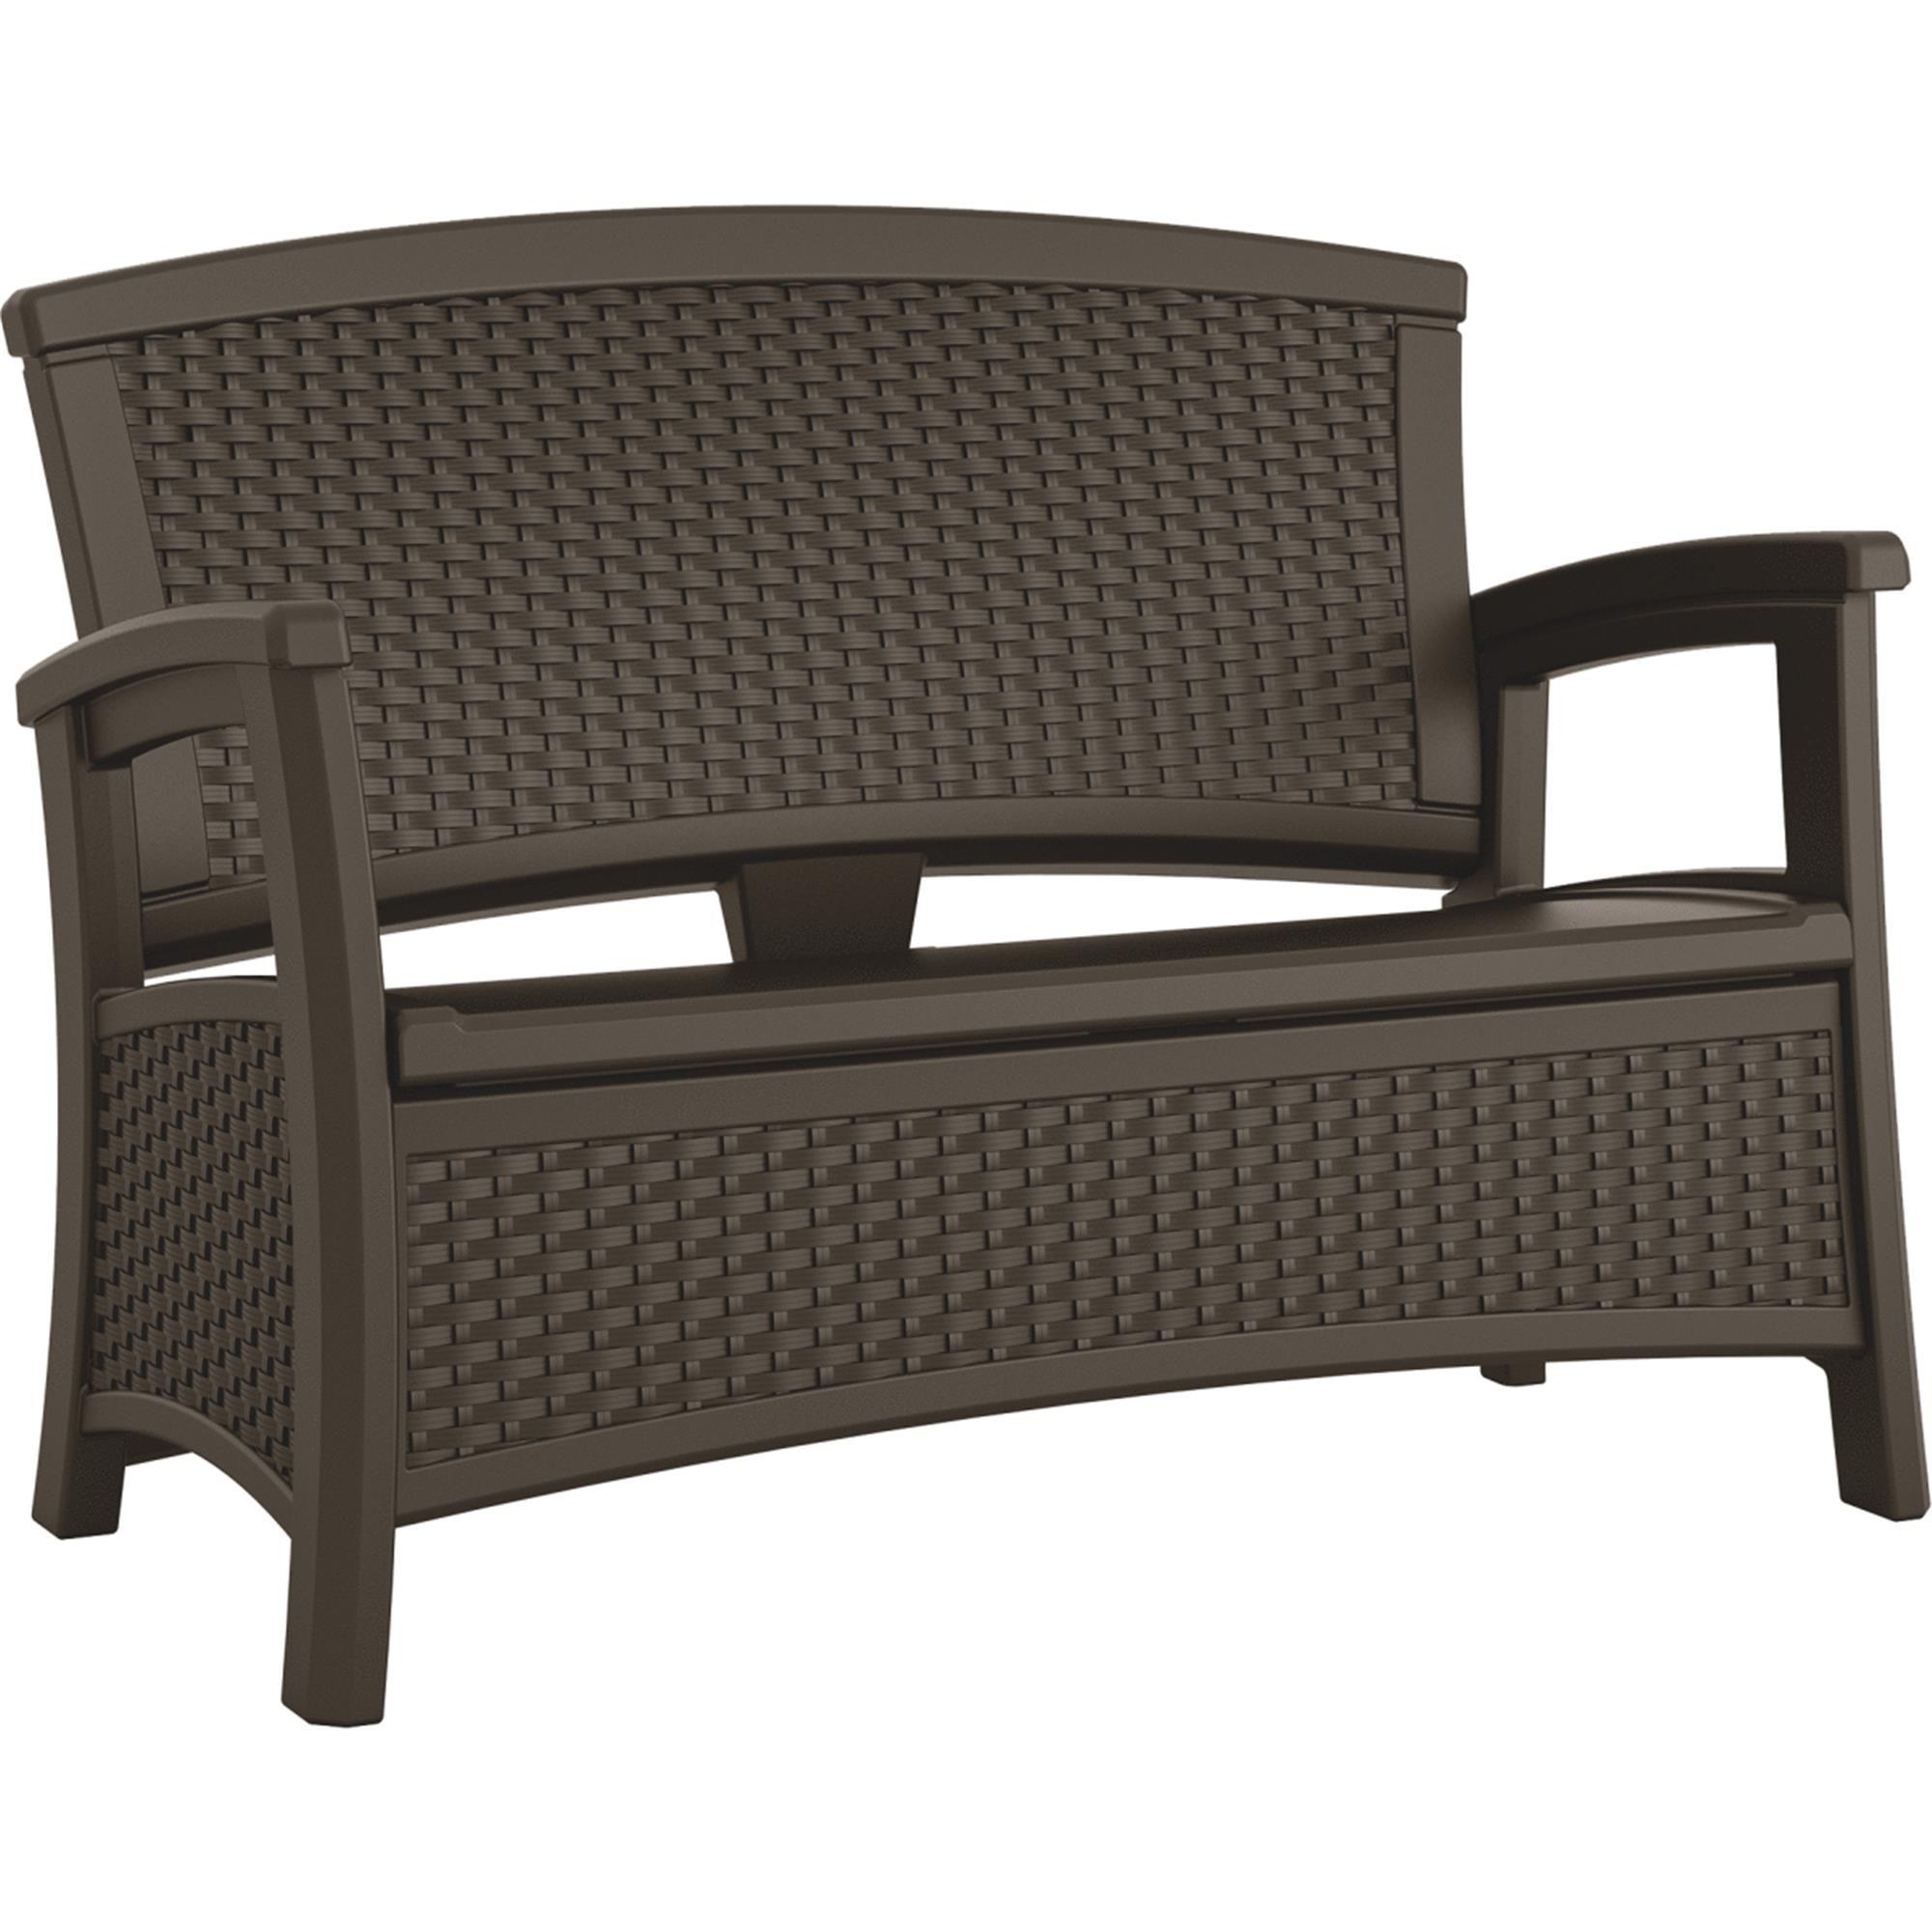 Suncast 23gal Love Seat Deck Box Bmwb5000 In Stock Loveseat Storage Bench Conveniently Stores Outdoor Ac In 2020 Patio Storage Outdoor Loveseat Resin Patio Furniture